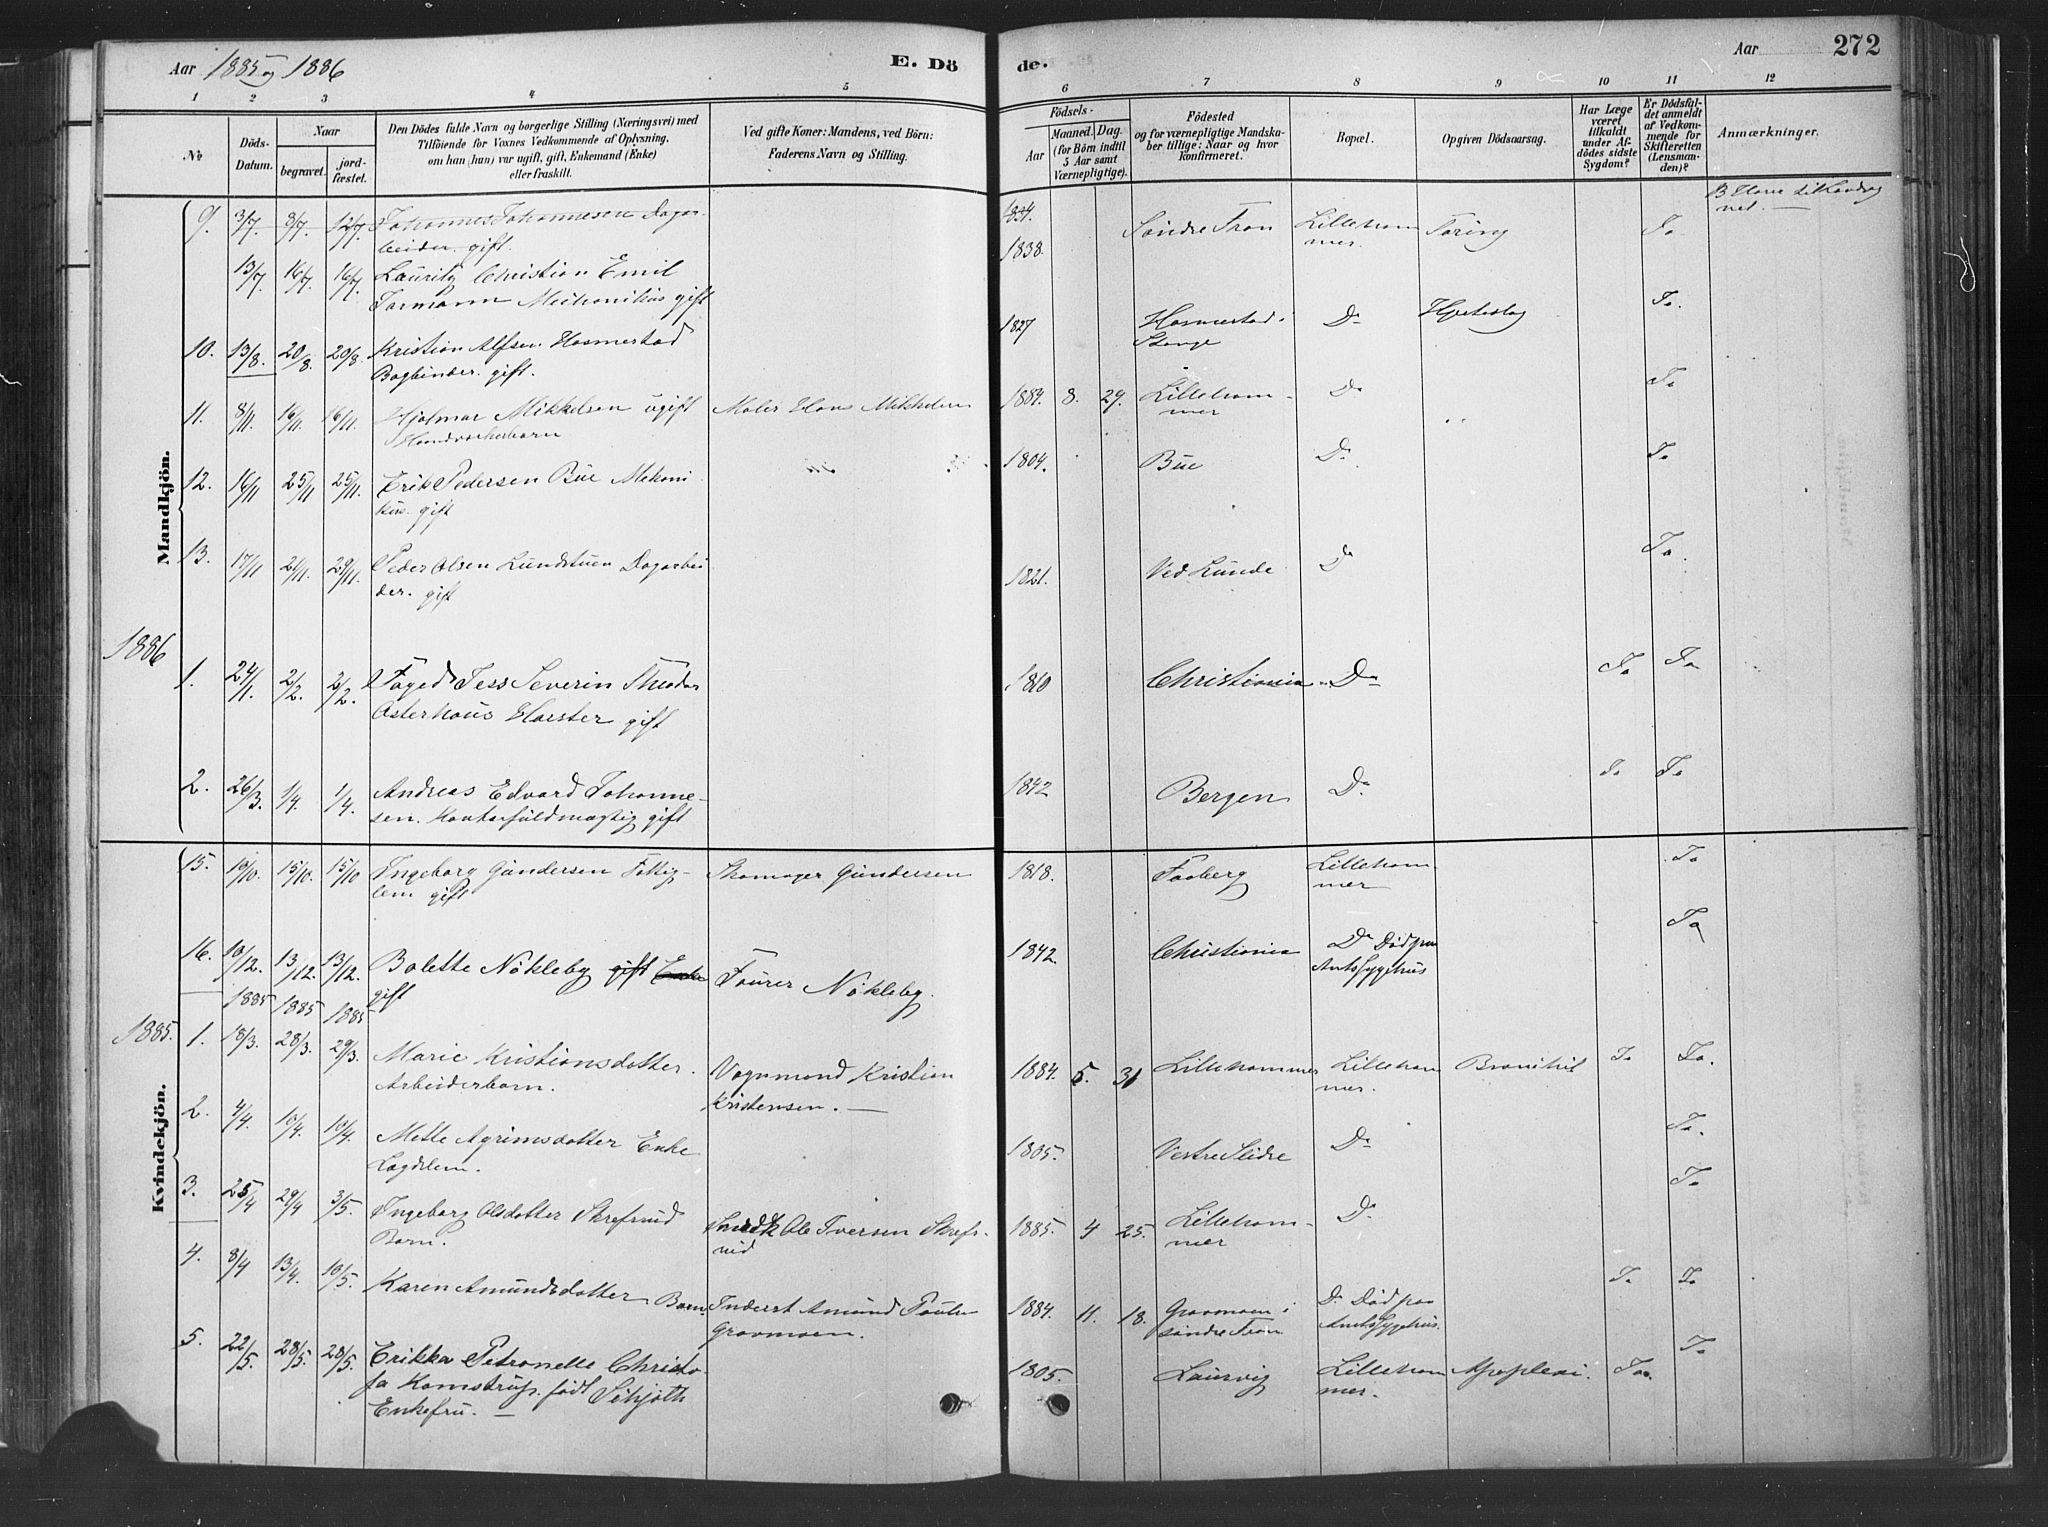 SAH, Fåberg prestekontor, Ministerialbok nr. 10, 1879-1900, s. 272